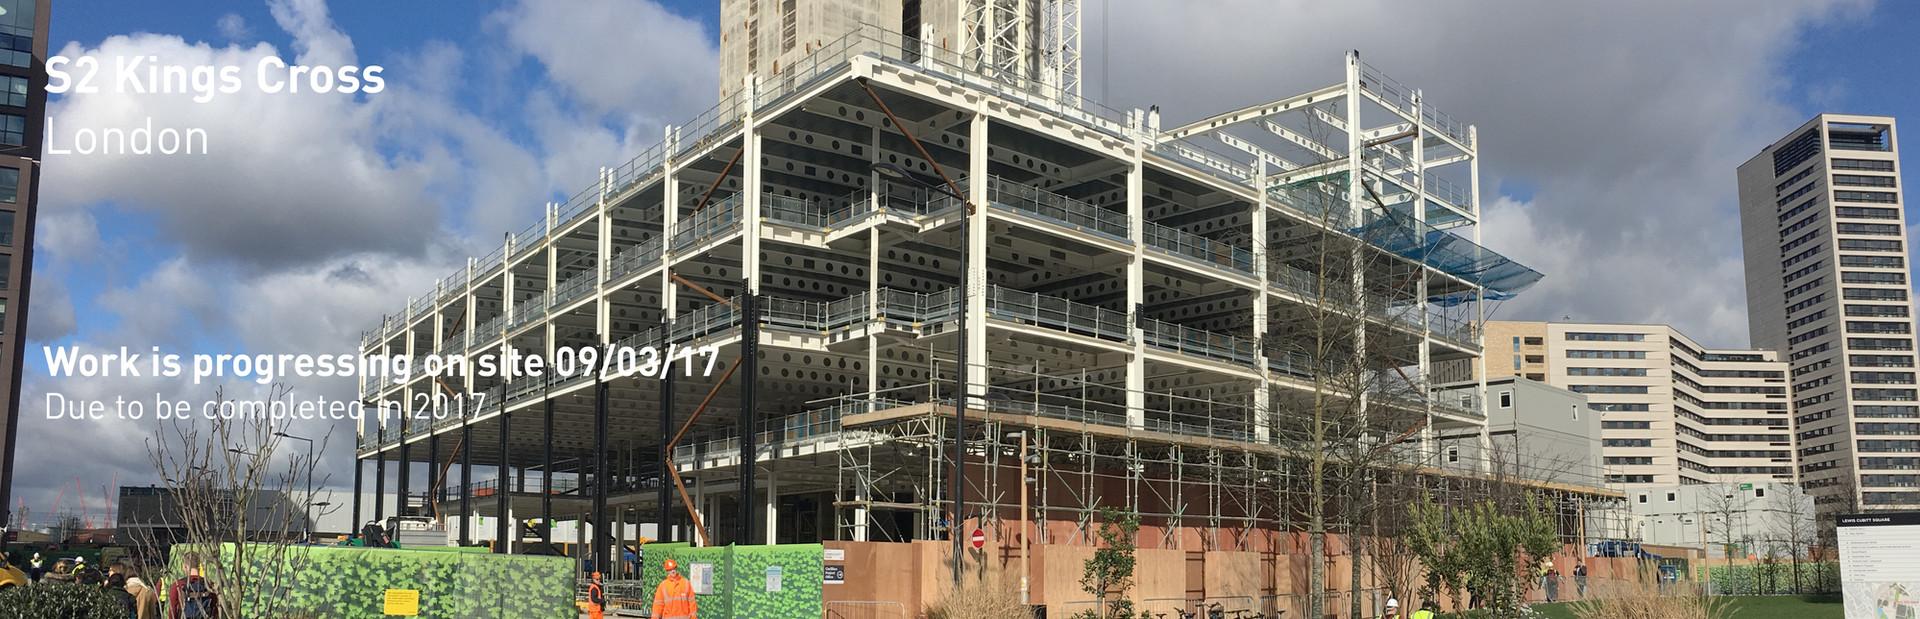 2017-03-10 – 14-101 – KXC – Construction